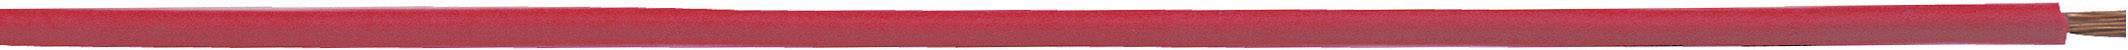 Opletenie / lanko LappKabel 4510021S H05V-K, 1 x 0.50 mm², vonkajší Ø 2.50 mm, 250 m, modrá